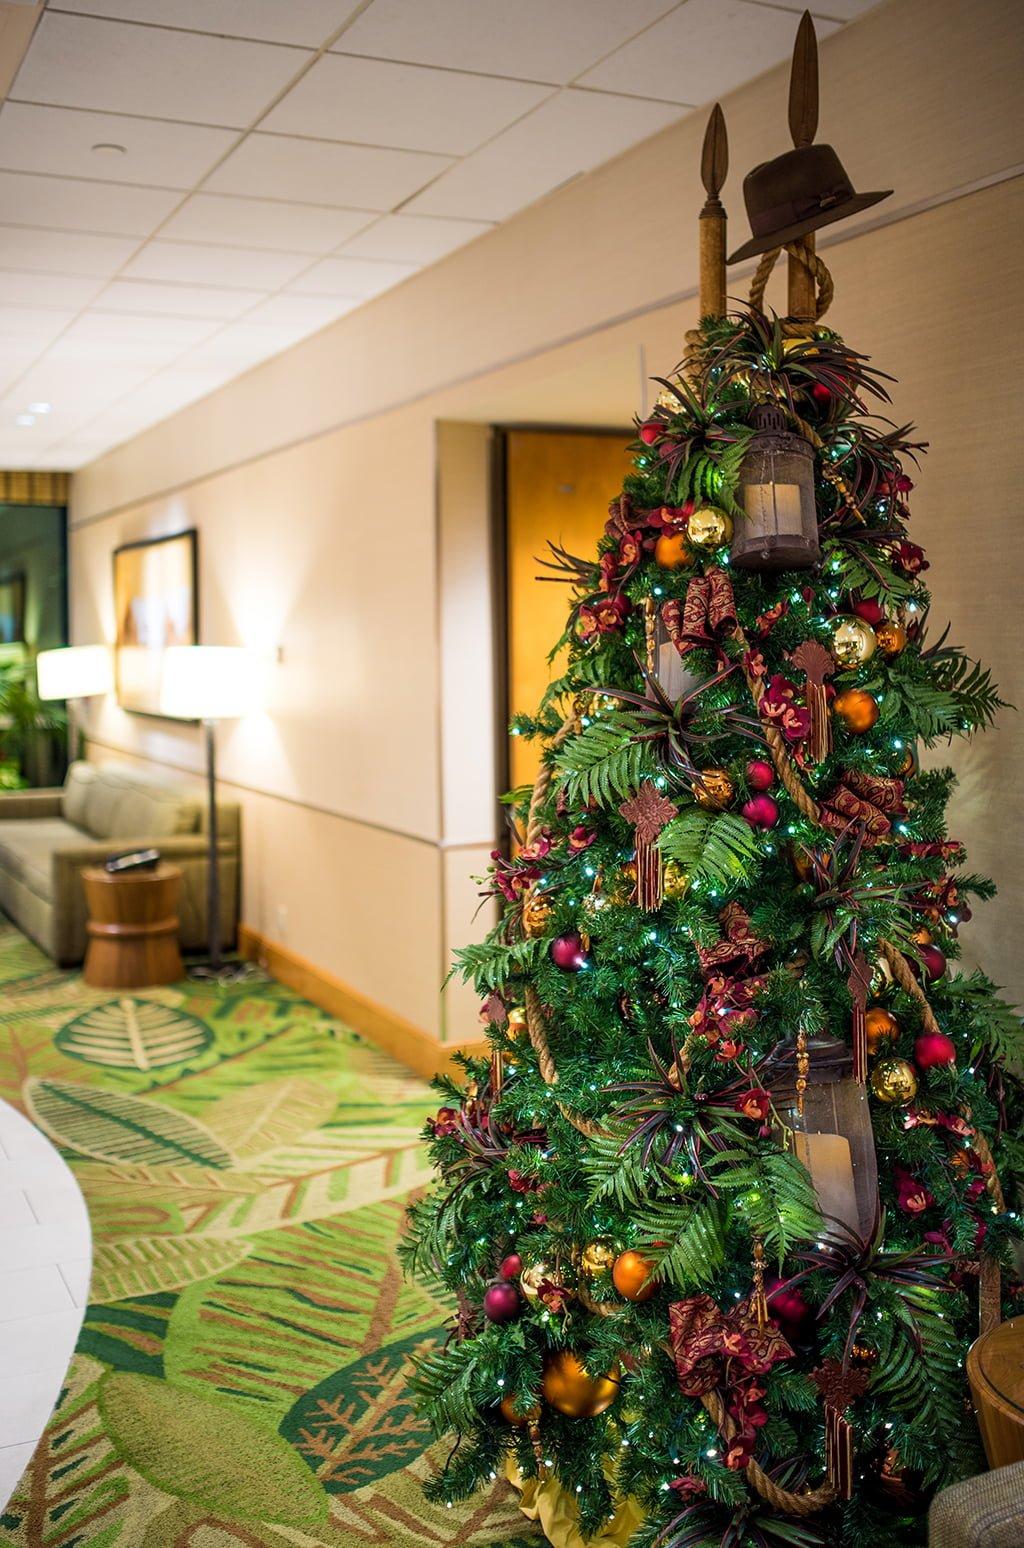 Disney christmas decorations for home - Disneyland Hotels Christmas Decorations 016